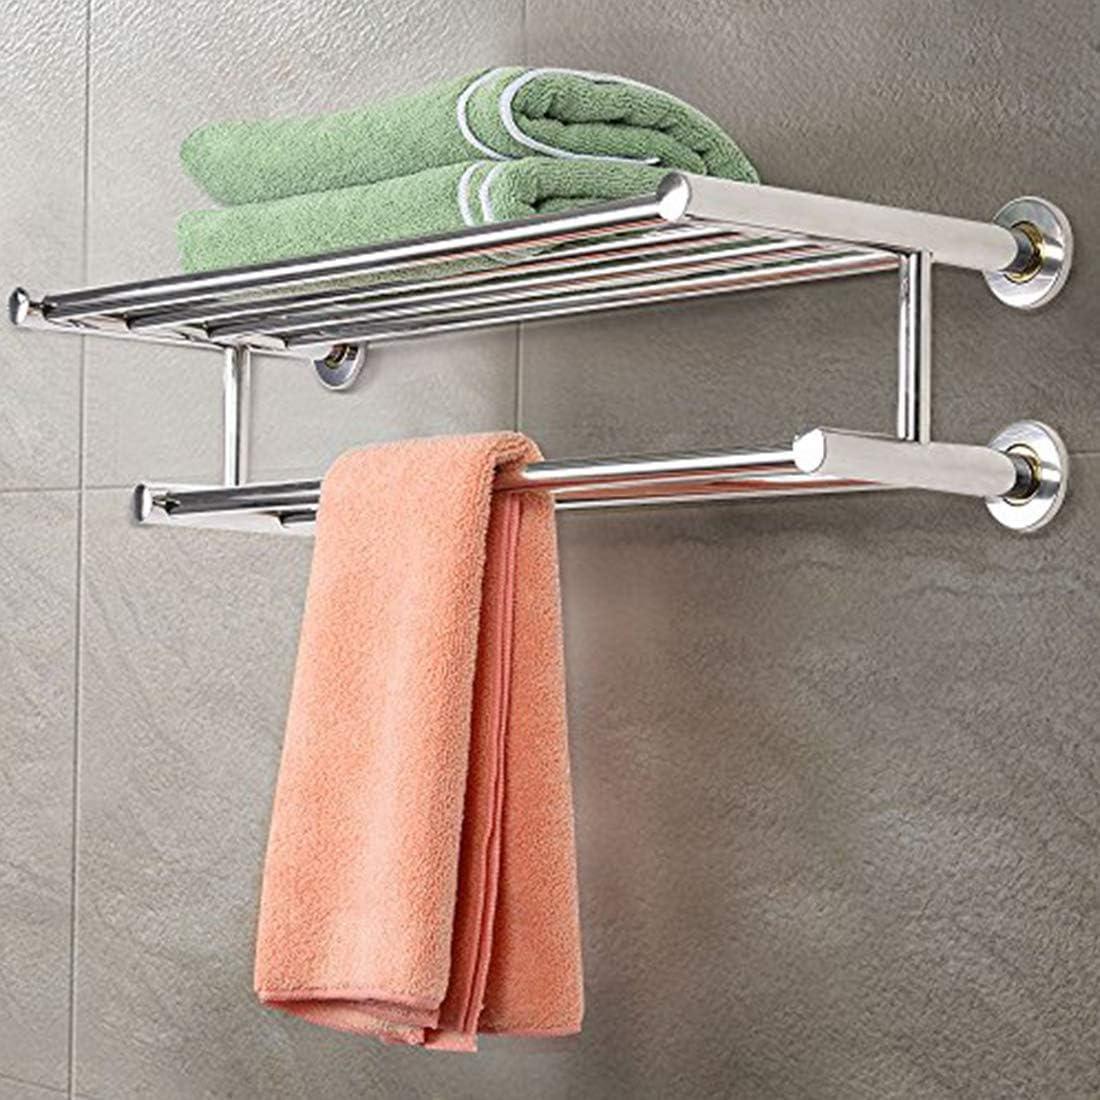 Towel Holder Rack Bathroom Wall Bar Mounted Hotel Kitchen SEL